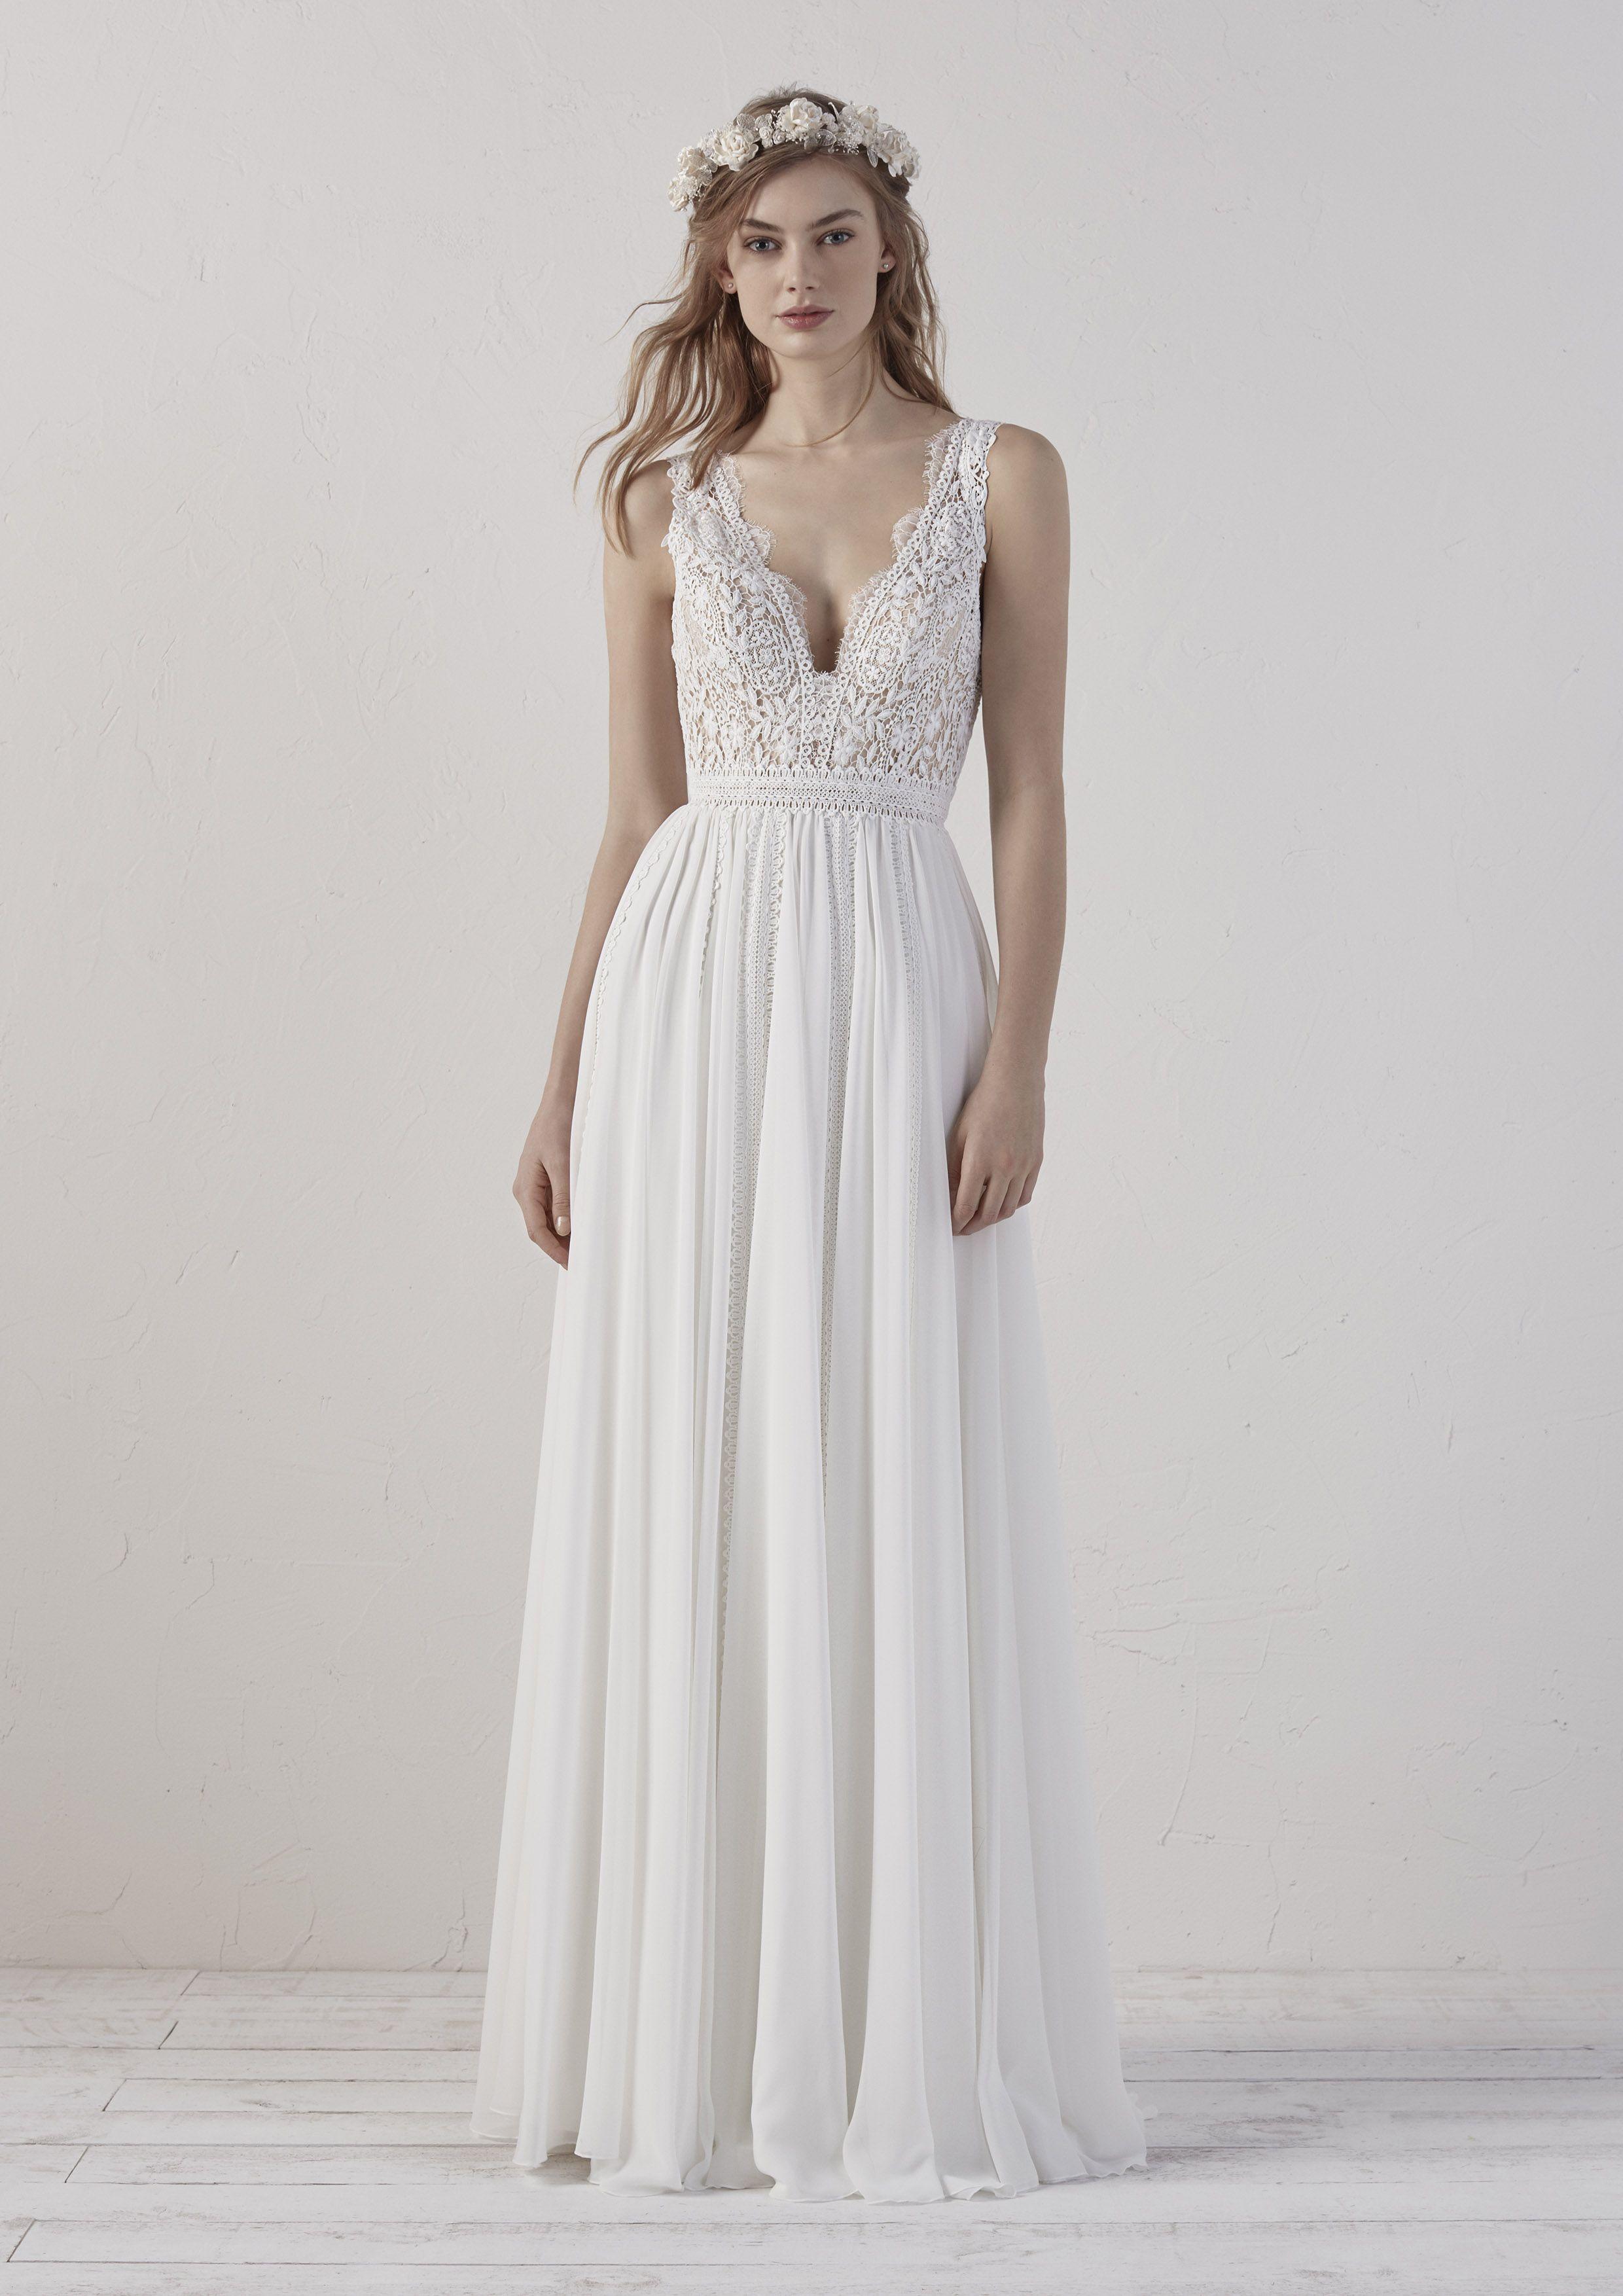 Brautmode Boho Style EFIGIE PRONOVIAS  Brautmode, Hochzeitskleid